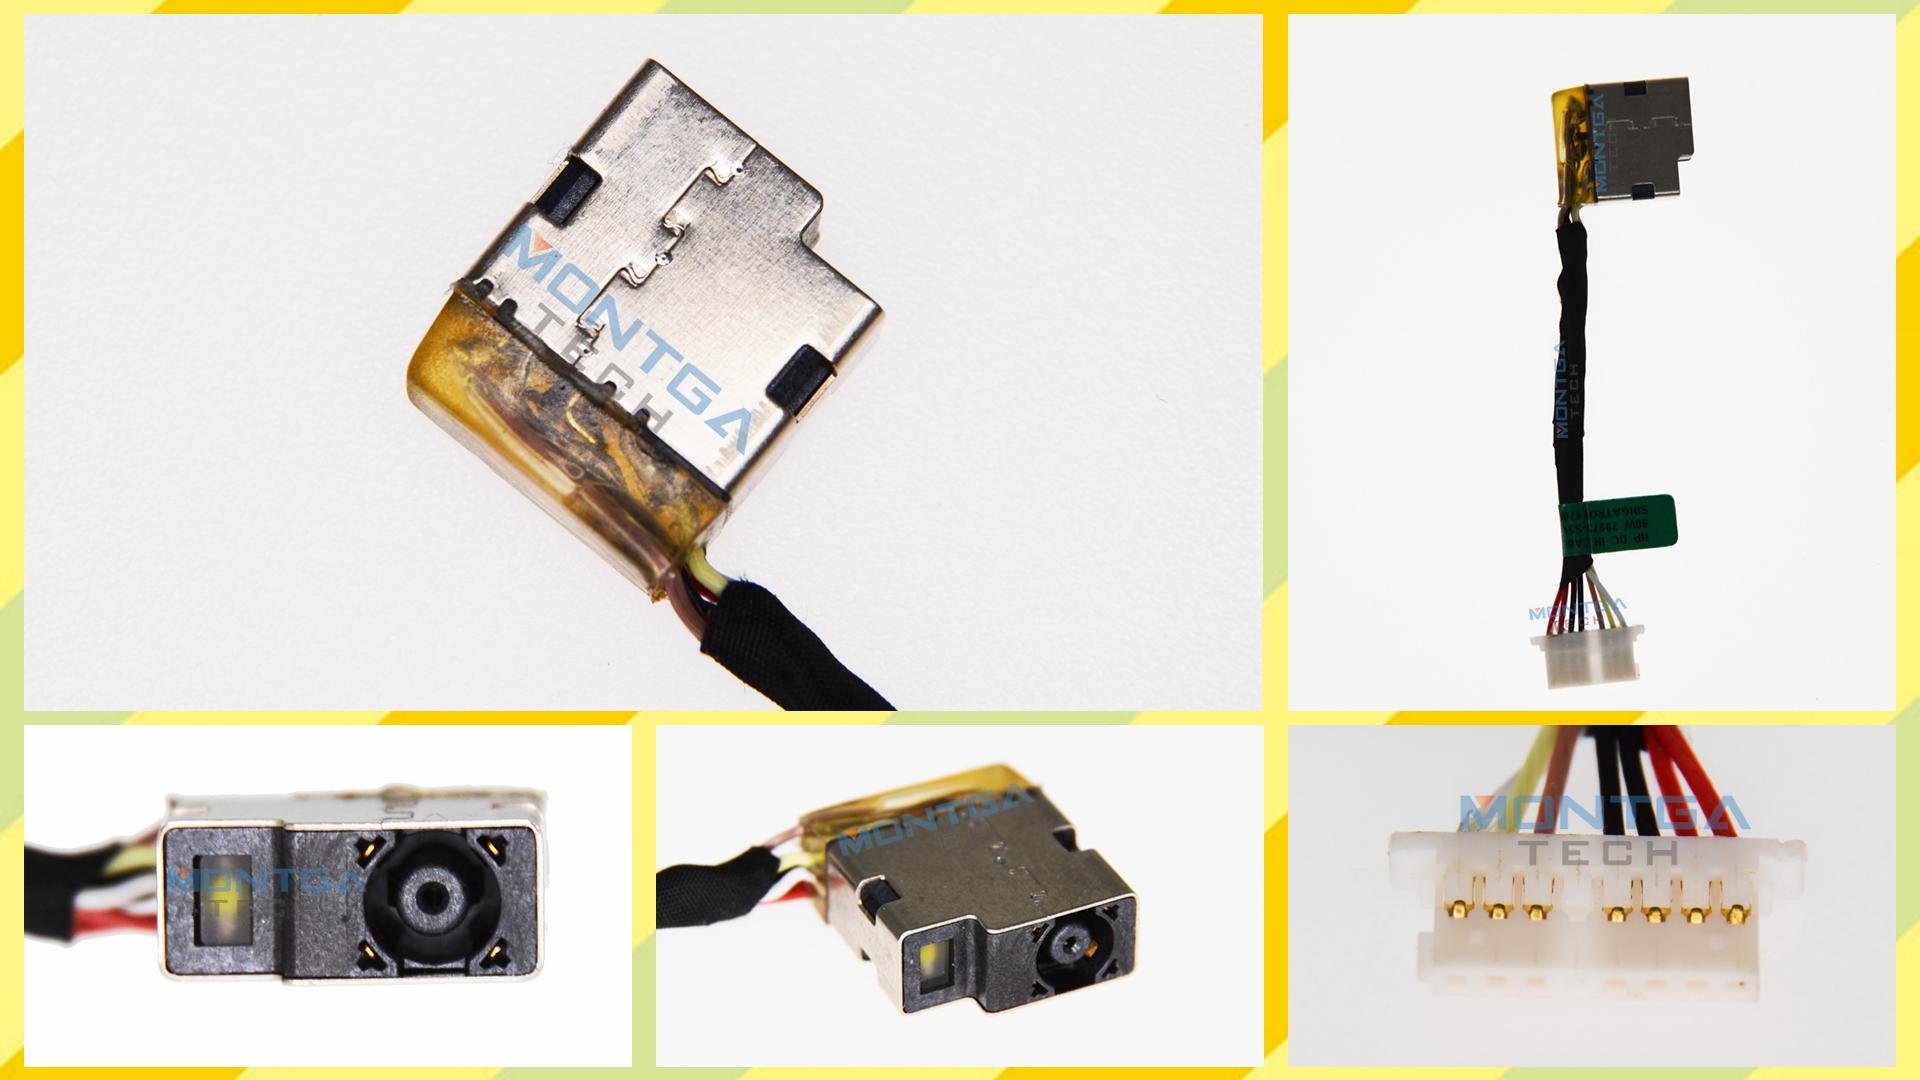 HP 13-AH007NF charging connector, HP 13-AH007NF DC Power Jack, HP 13-AH007NF DC IN Cable, HP 13-AH007NF Power Jack, HP 13-AH007NF plug, HP 13-AH007NF Jack socket, HP 13-AH007NF connecteur de charge,